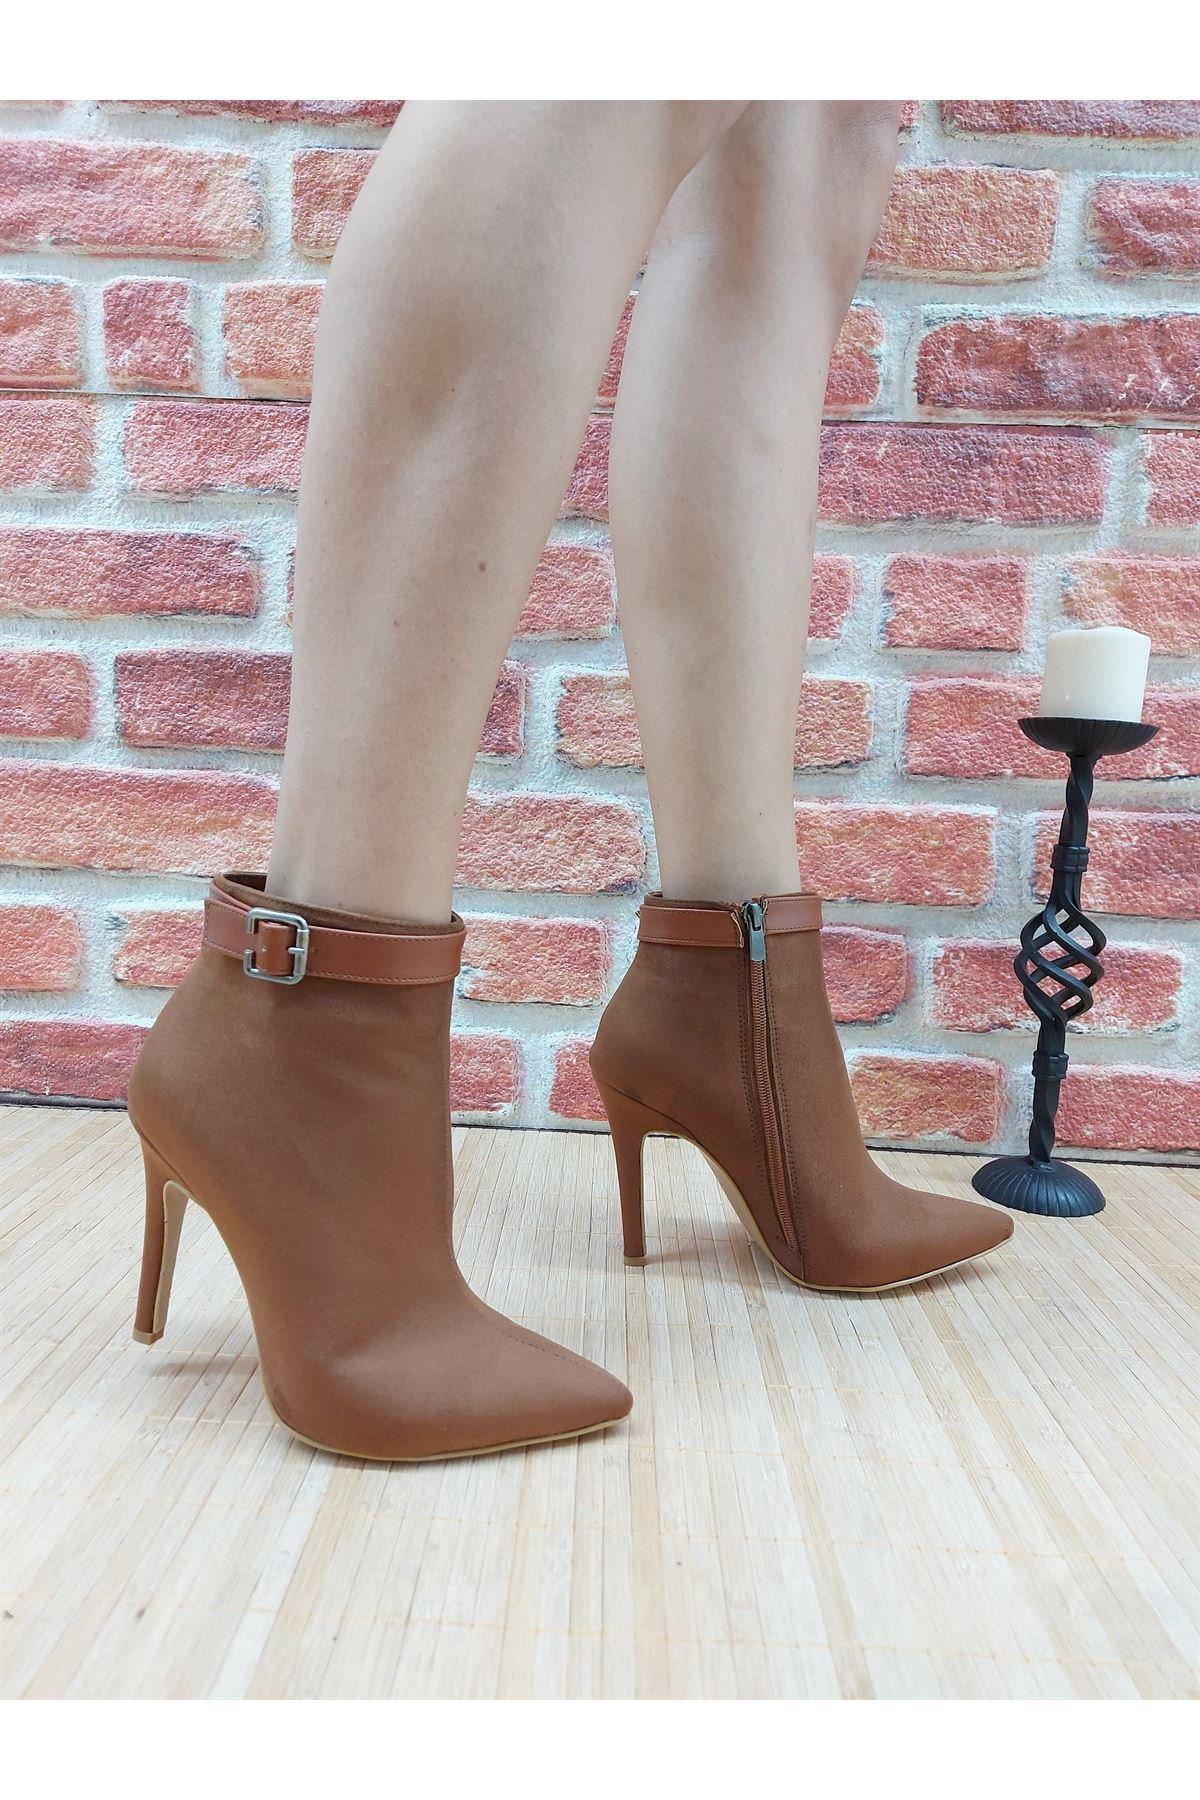 Ventos Taba Süet Stiletto Topuklu Kadın Bot